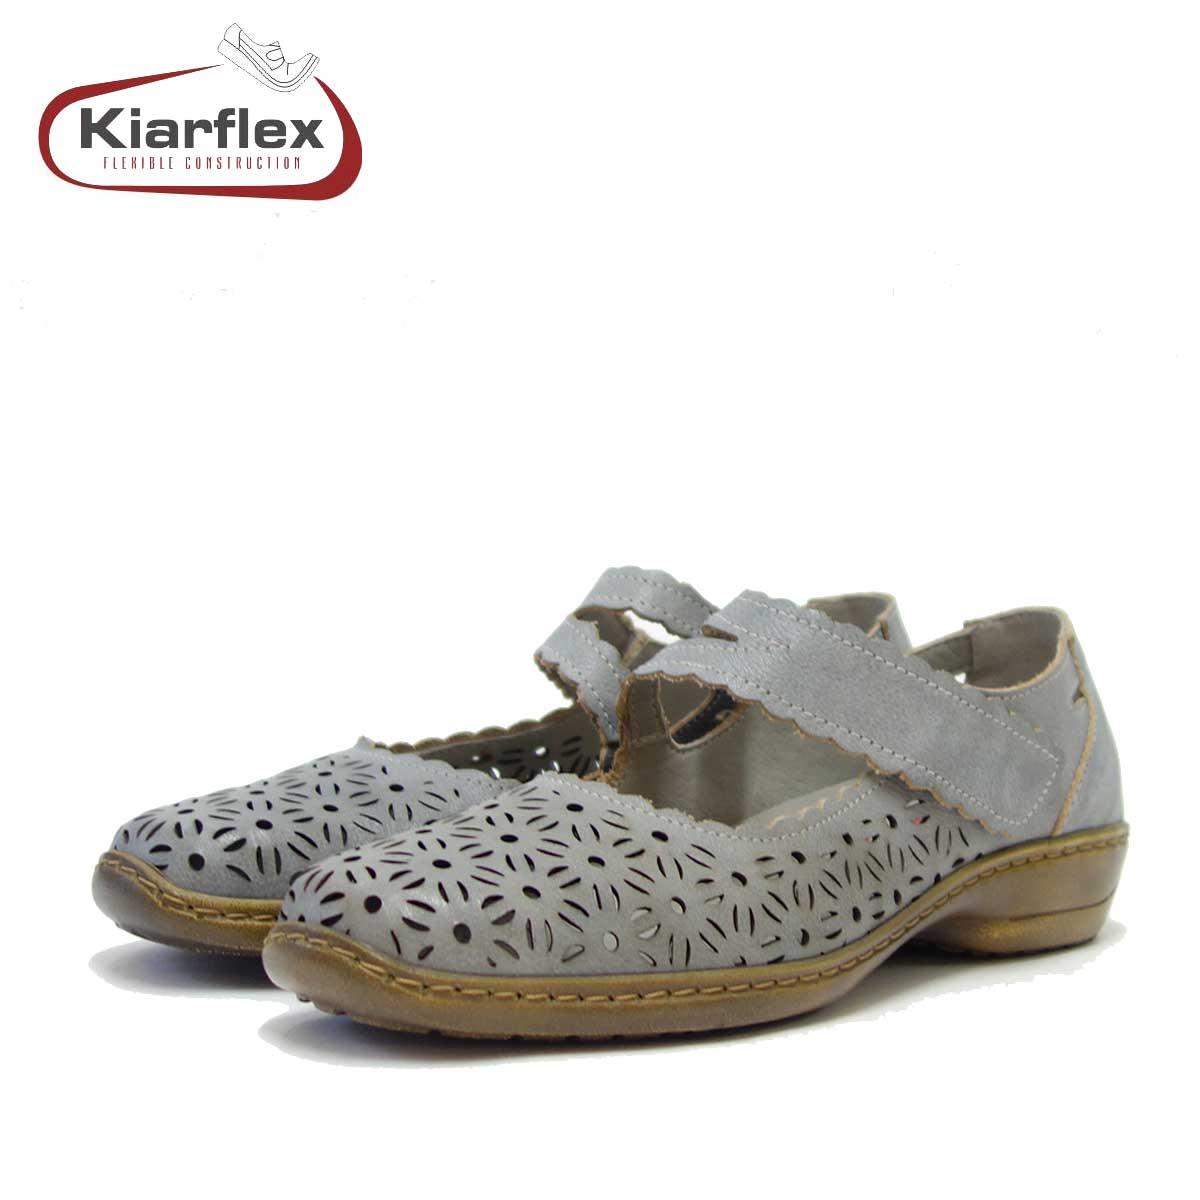 Kiarflex キアラフレックス 19040 004 ブルー (レディース) 屈曲性の良いお洒落ストラップシューズ 「靴」